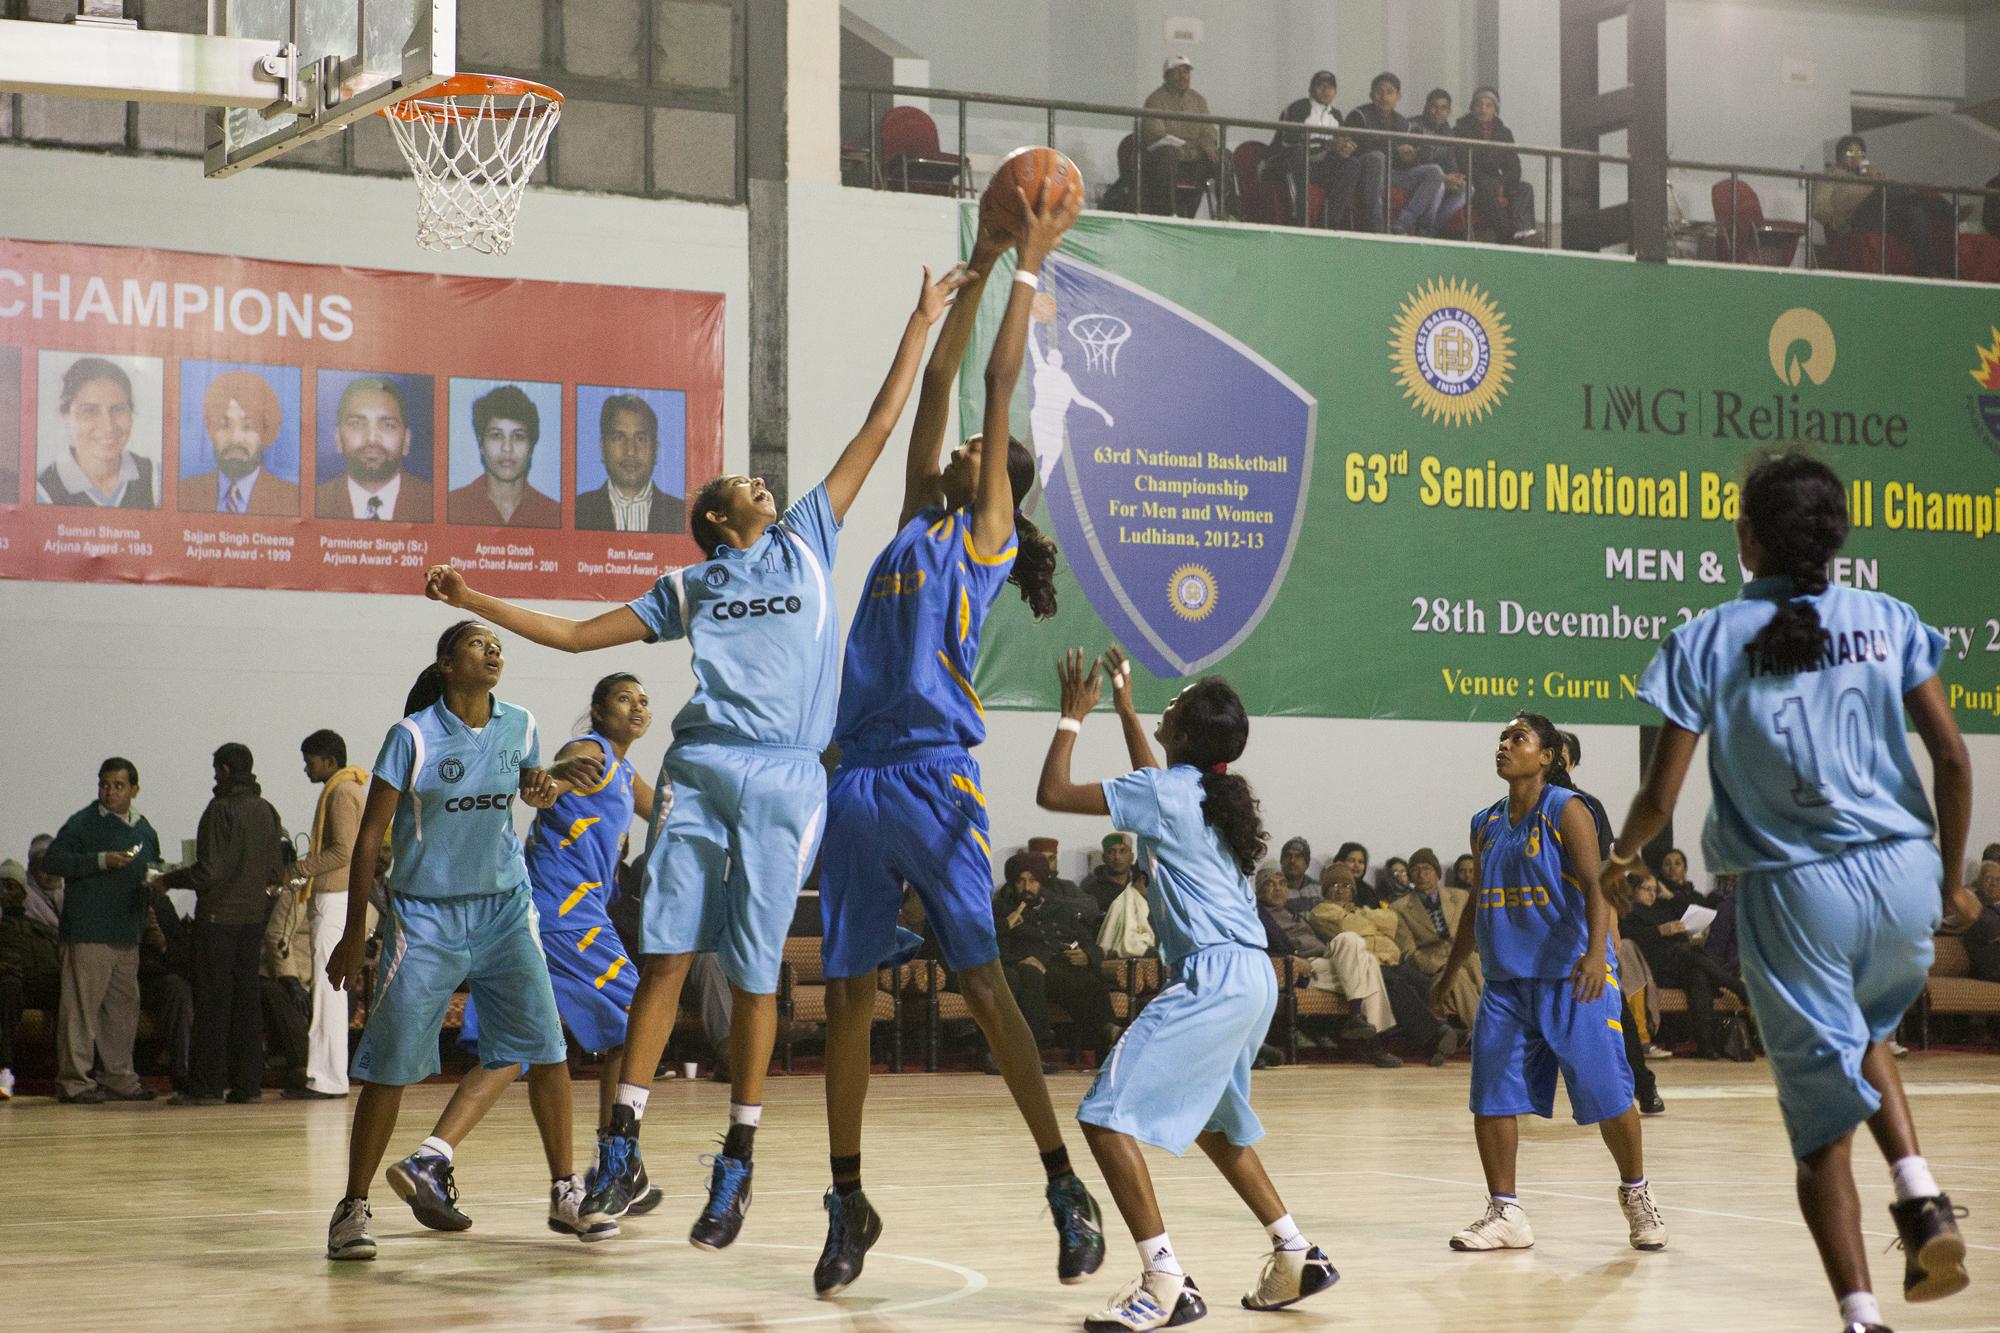 Poonam Chaturvedi 6'11 attacks the basket for team Chattisgarh. Tamil Nadu vs Chattisgarh.   63rd Senior National Basketball Championship, Ludhiana, Punjab, 2013.